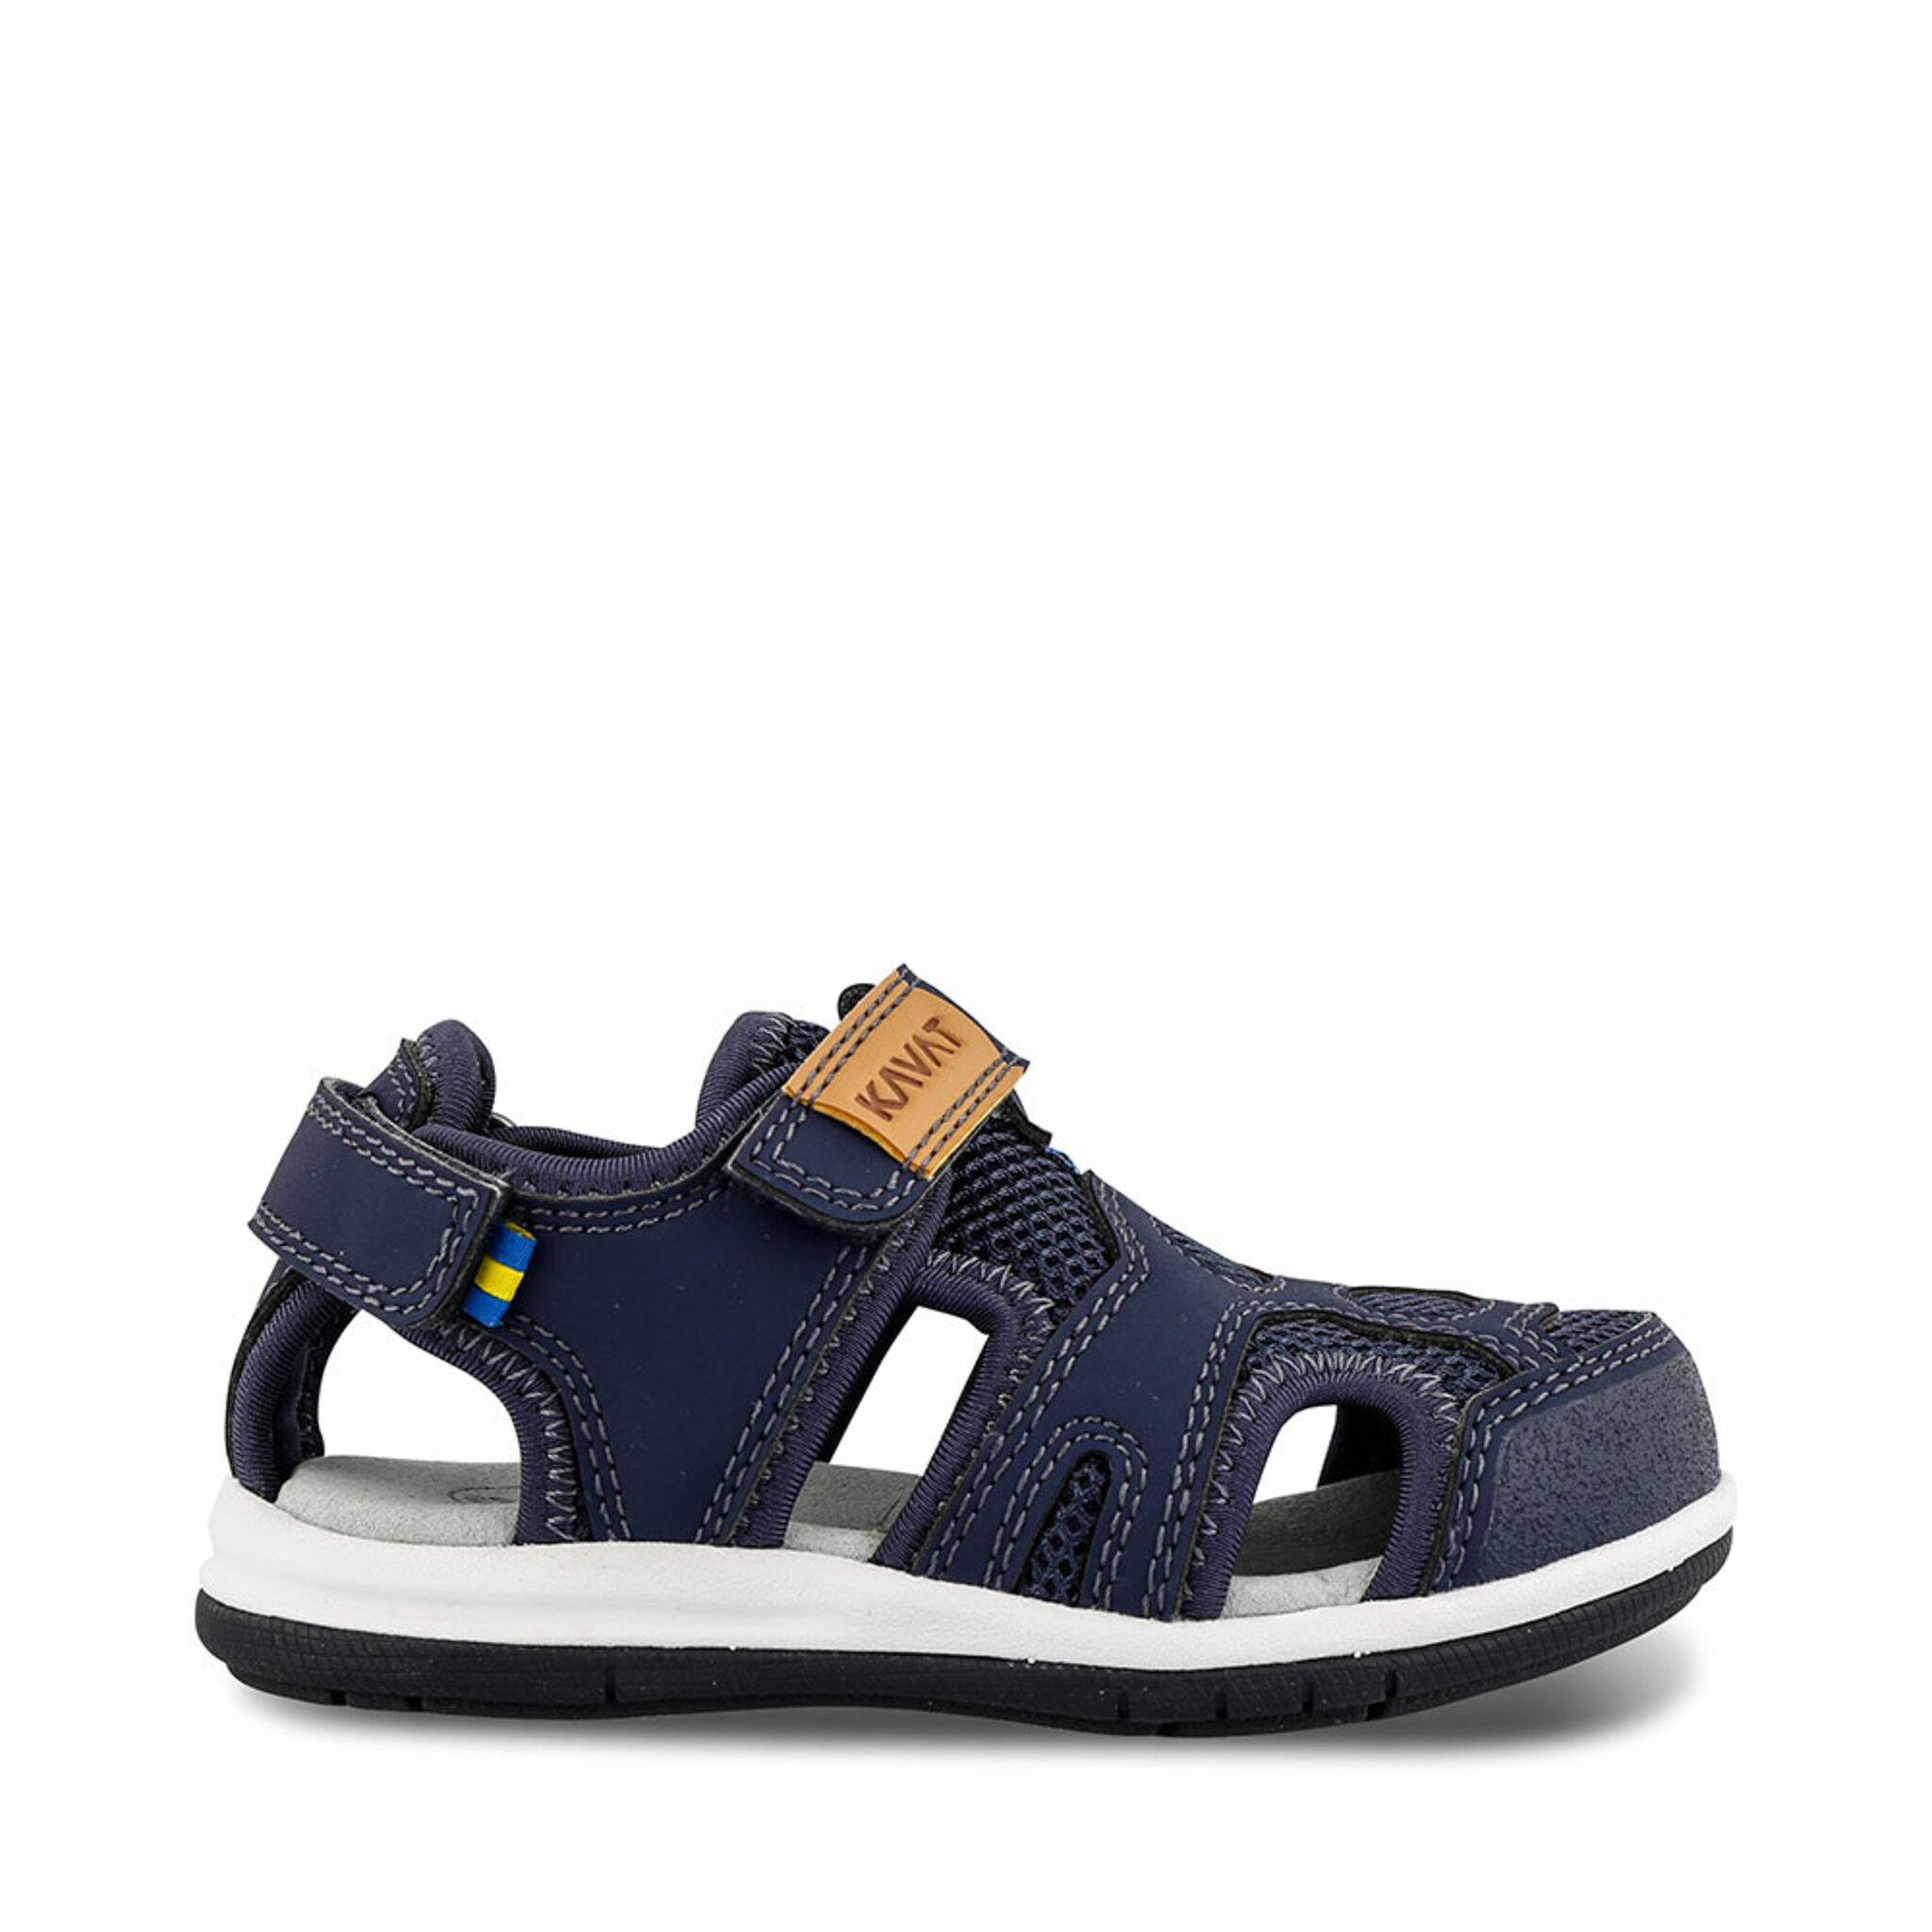 b0d8817efb79 Sandal